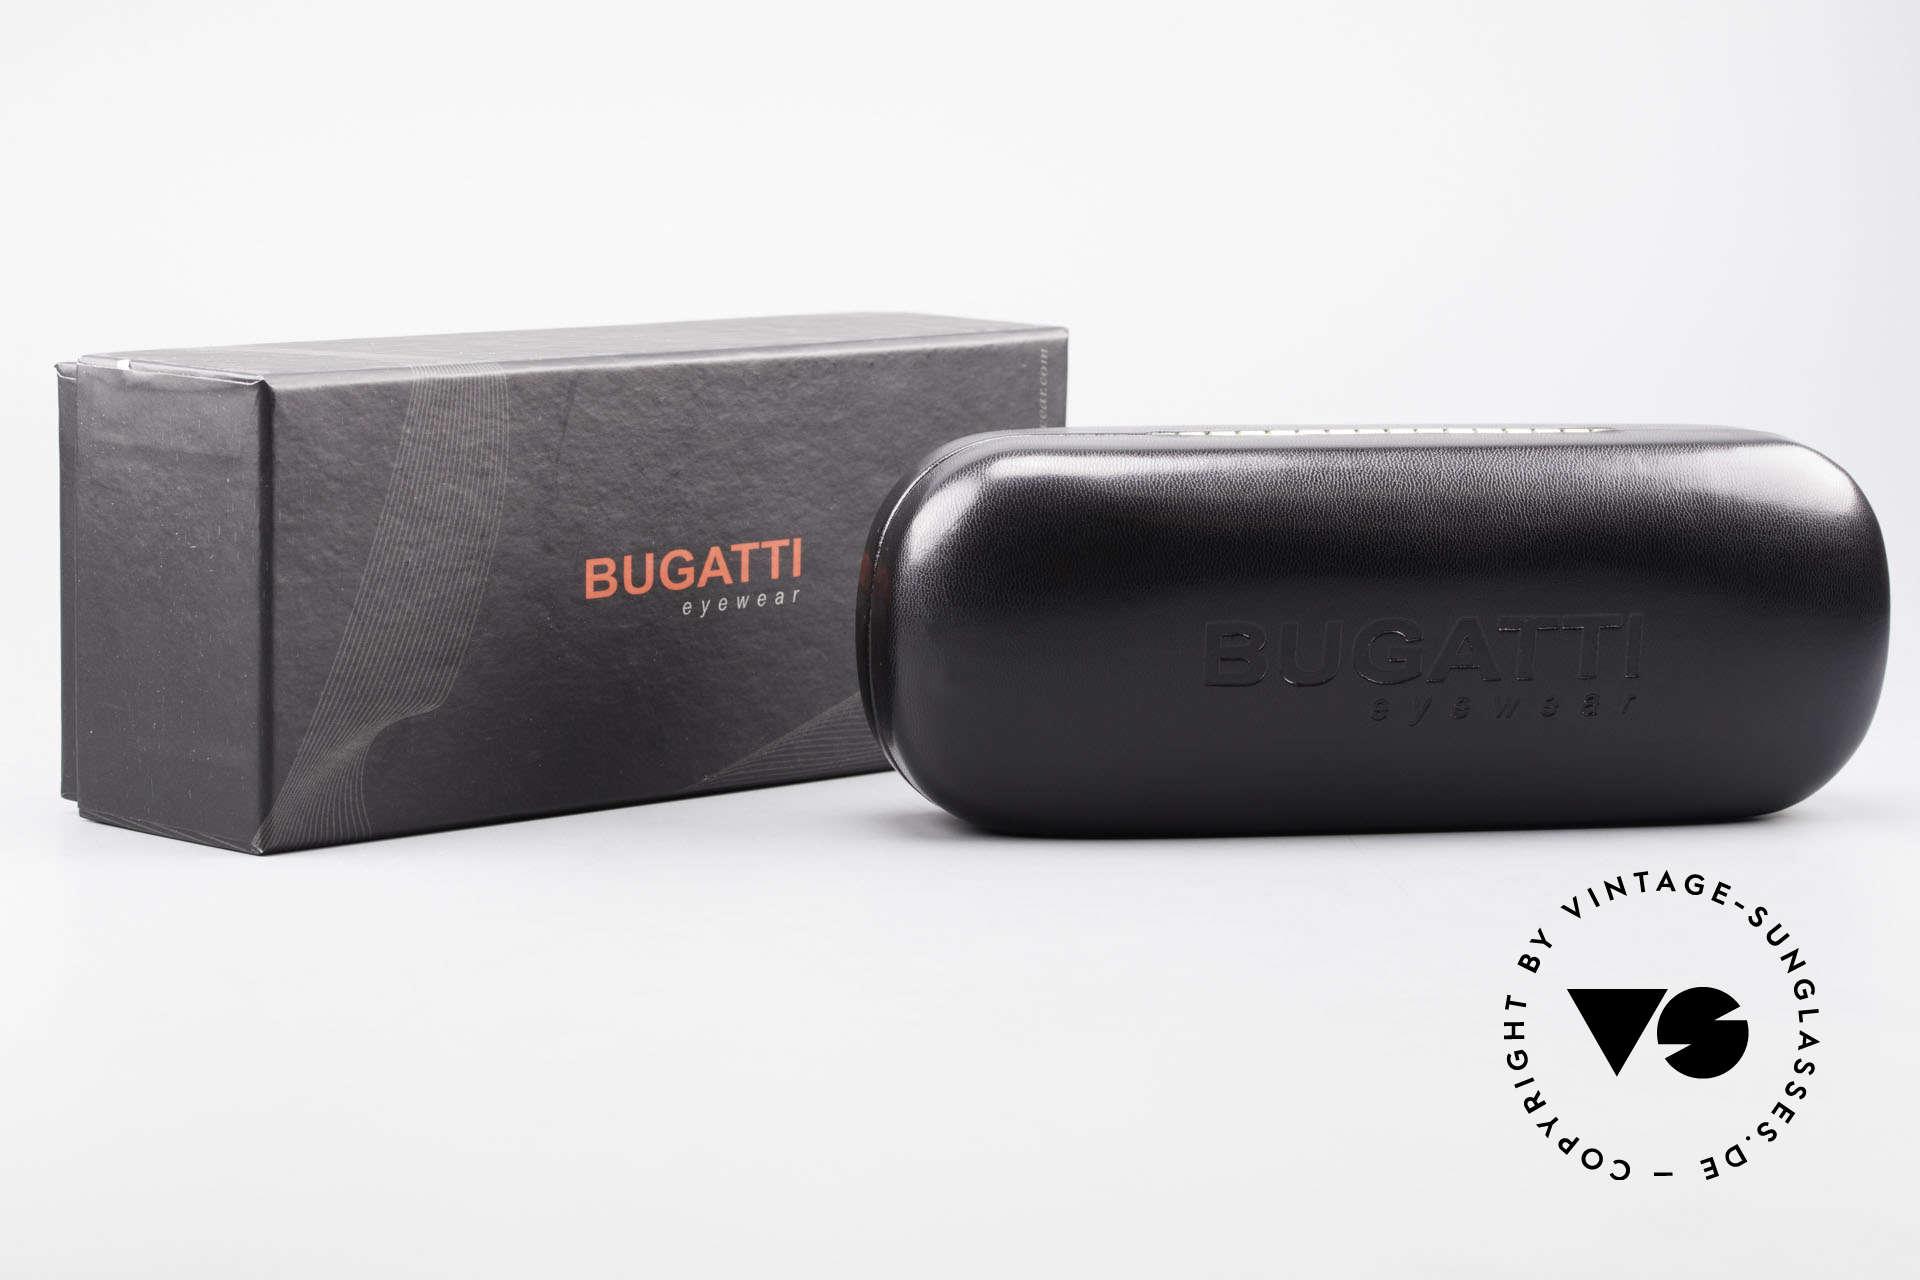 Bugatti 522 Padouk Precious Wood Gold, Size: medium, Made for Men